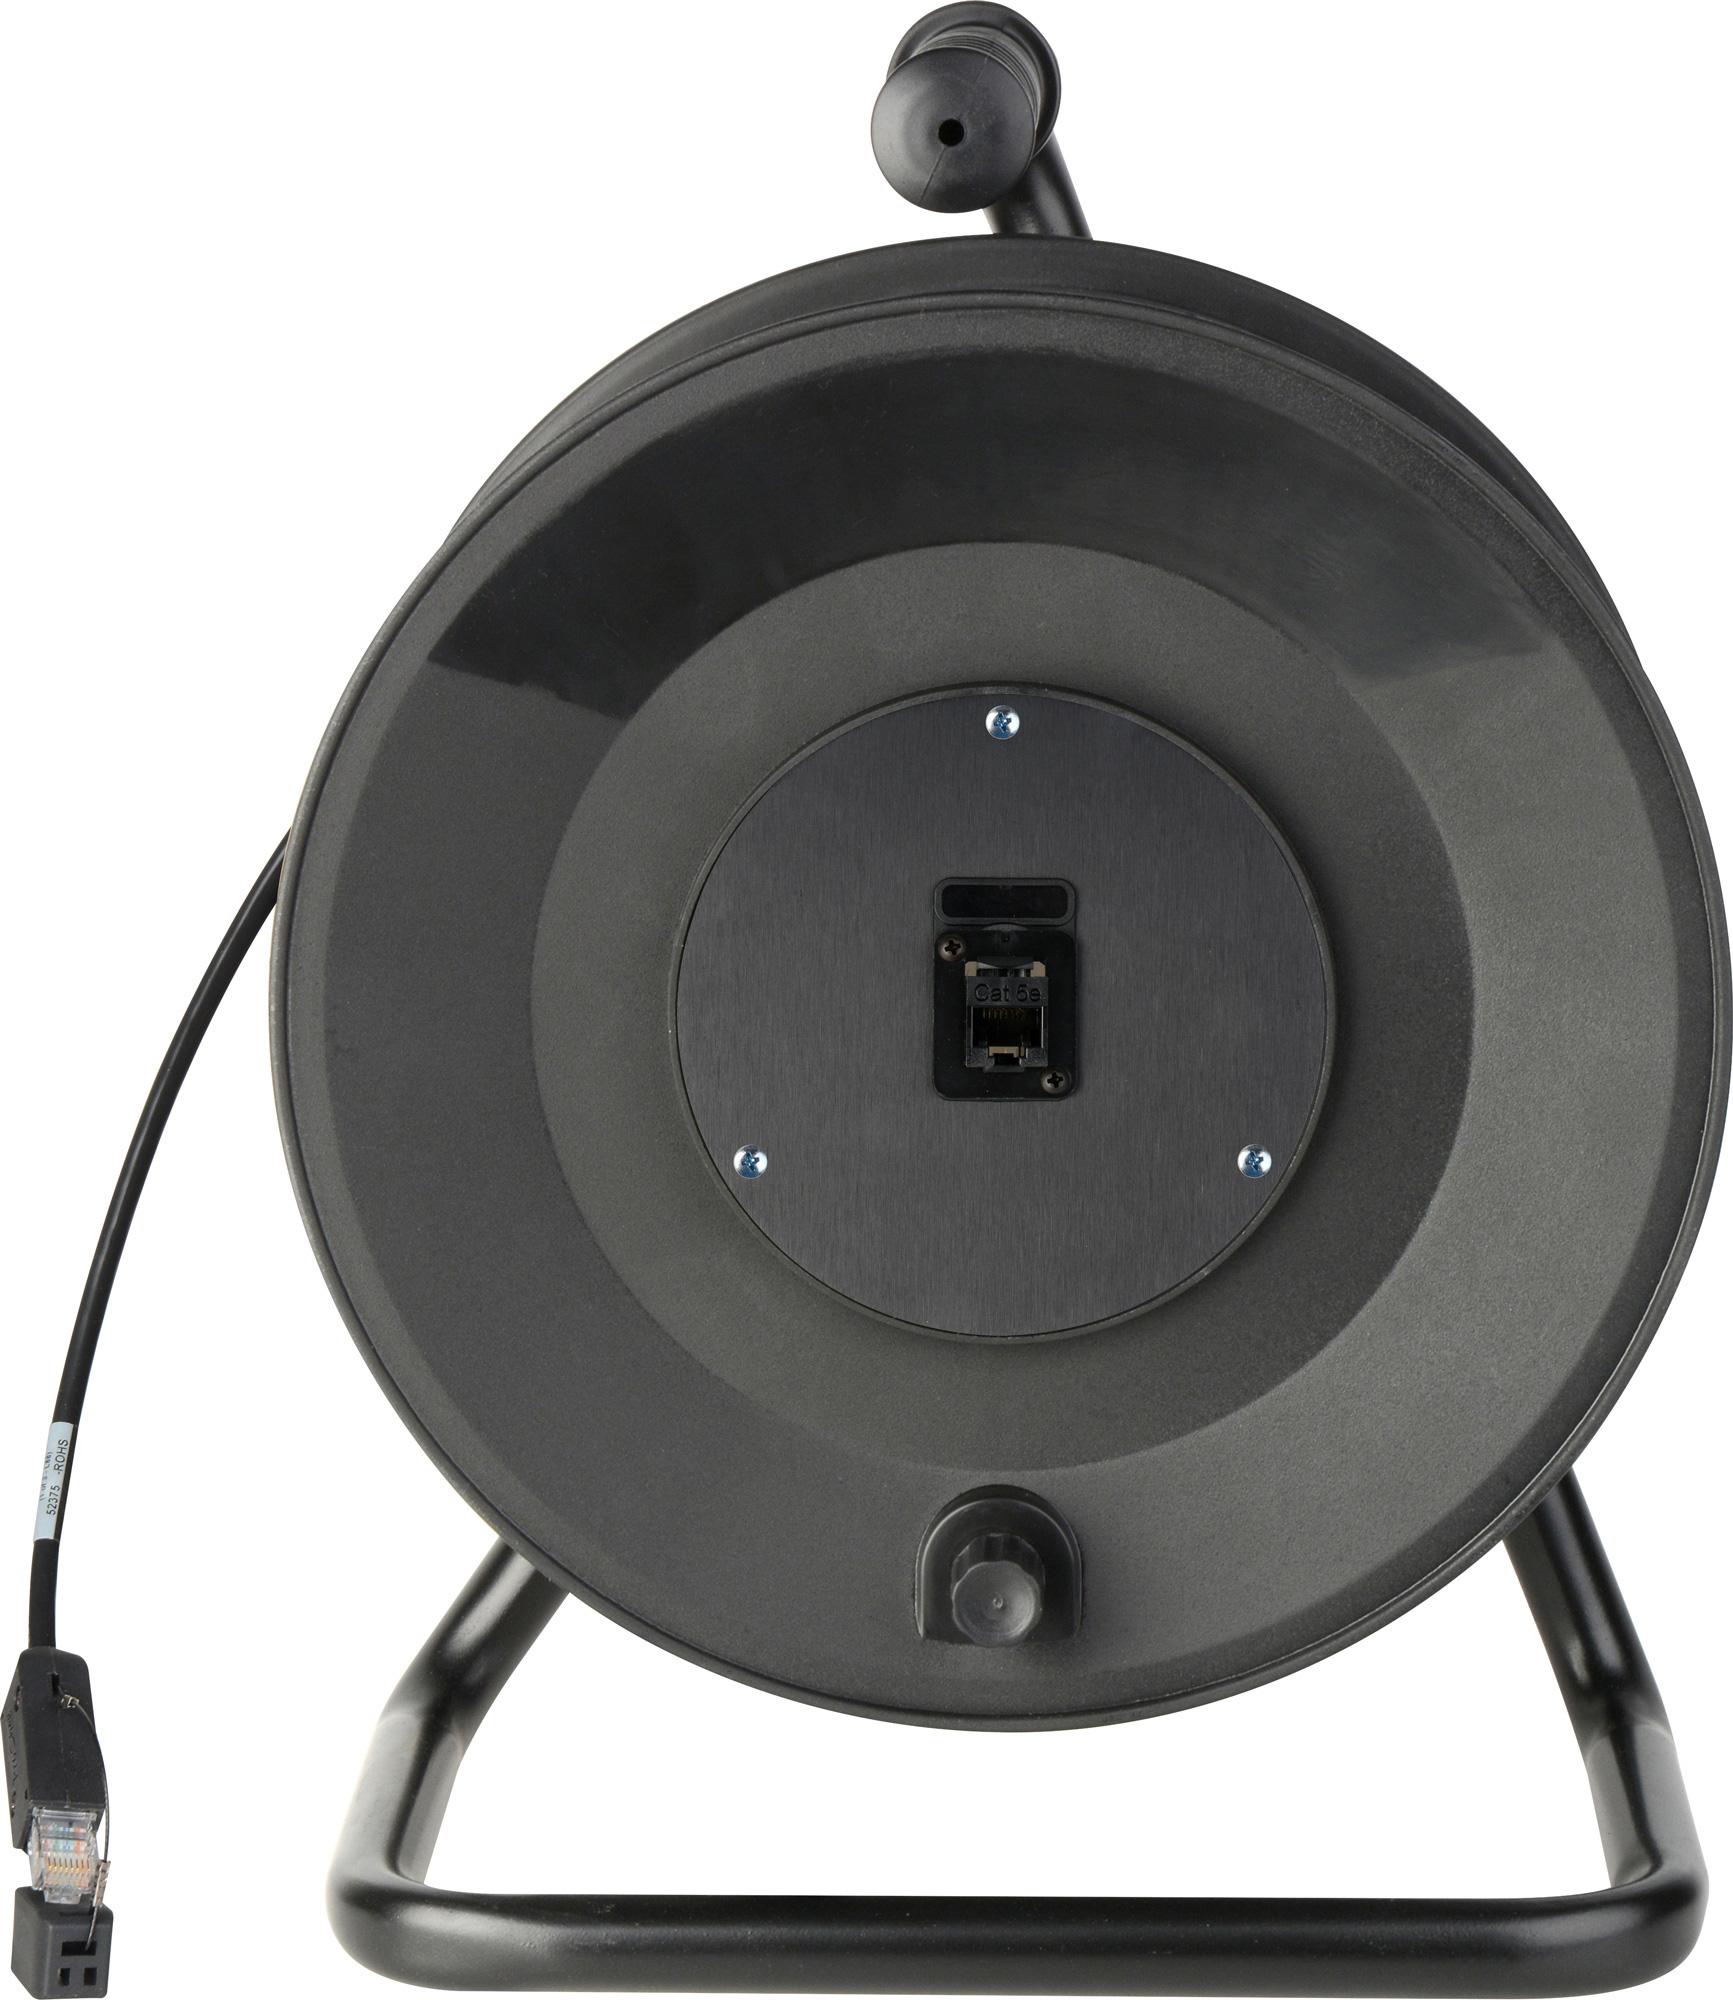 Jackreel Deluxe CAT5 made with Belden 1583 Datatwist Cable MKR-12-328